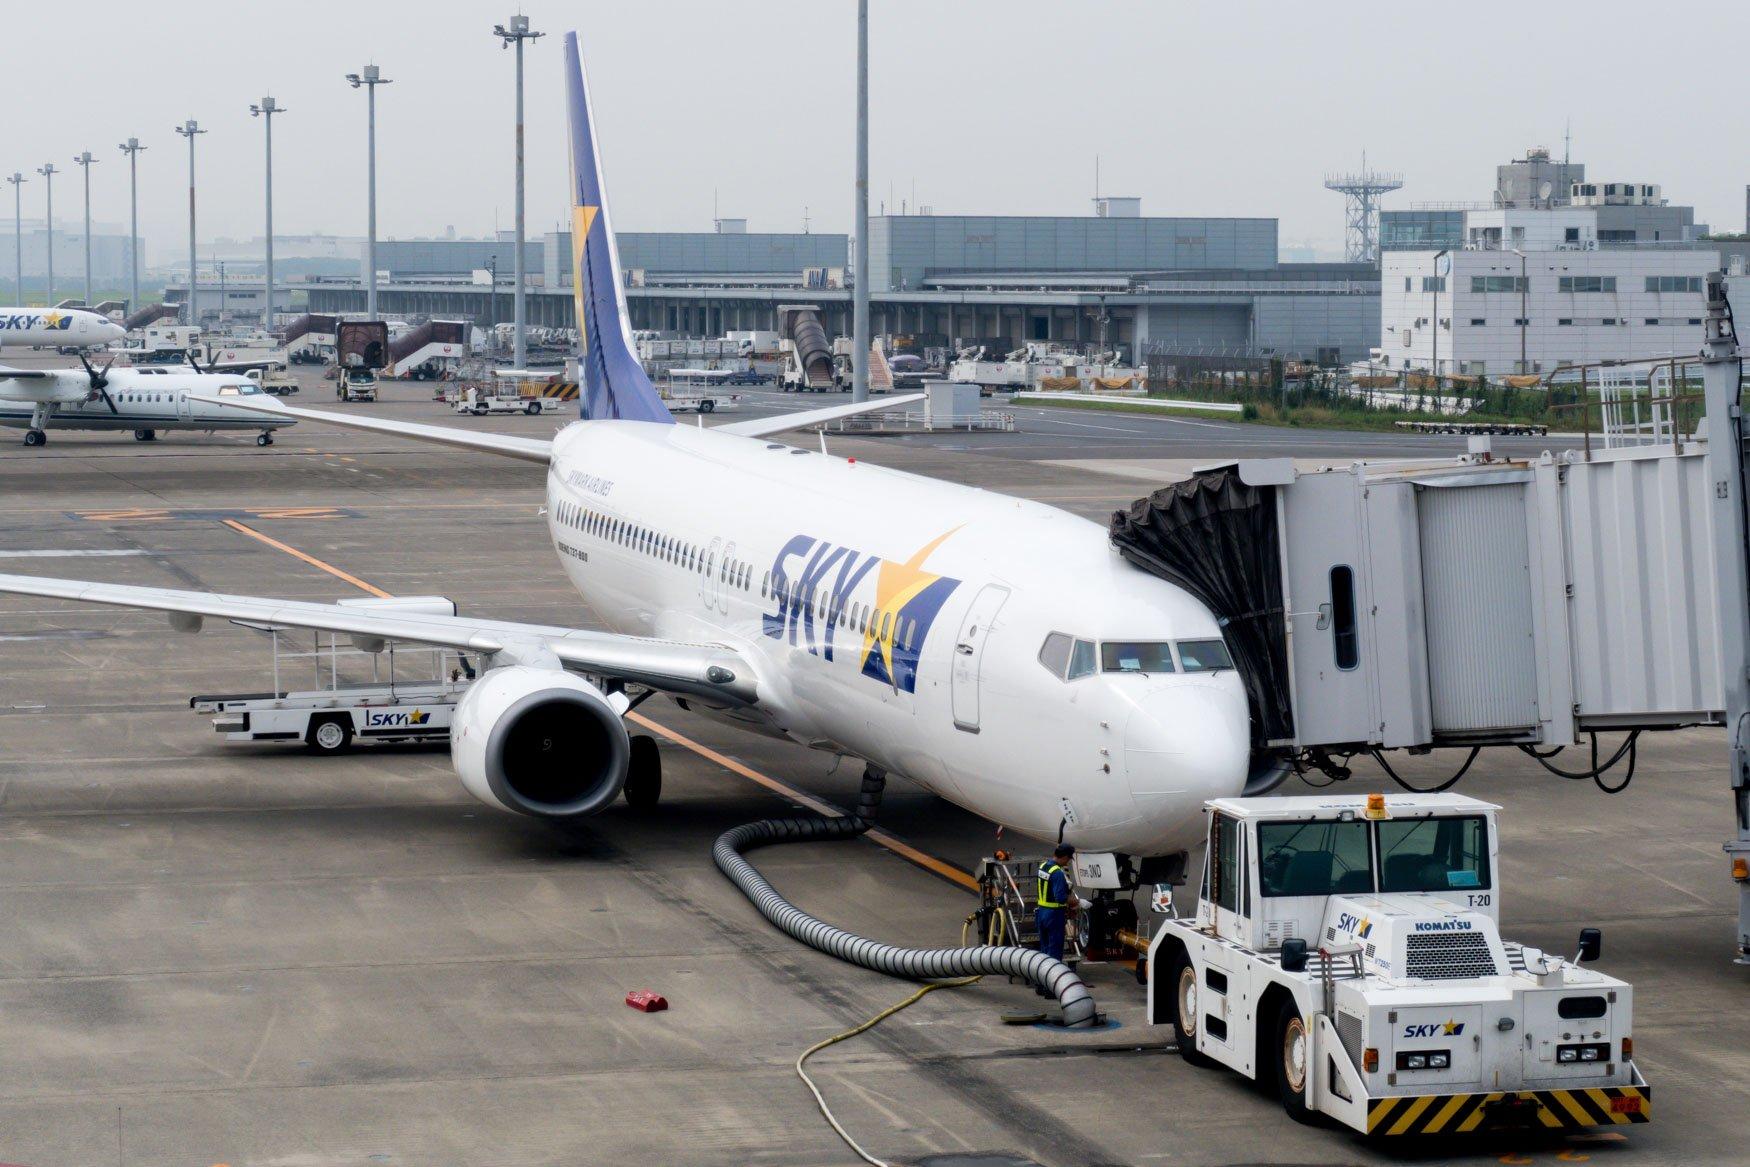 Skymark Airlines 737-800